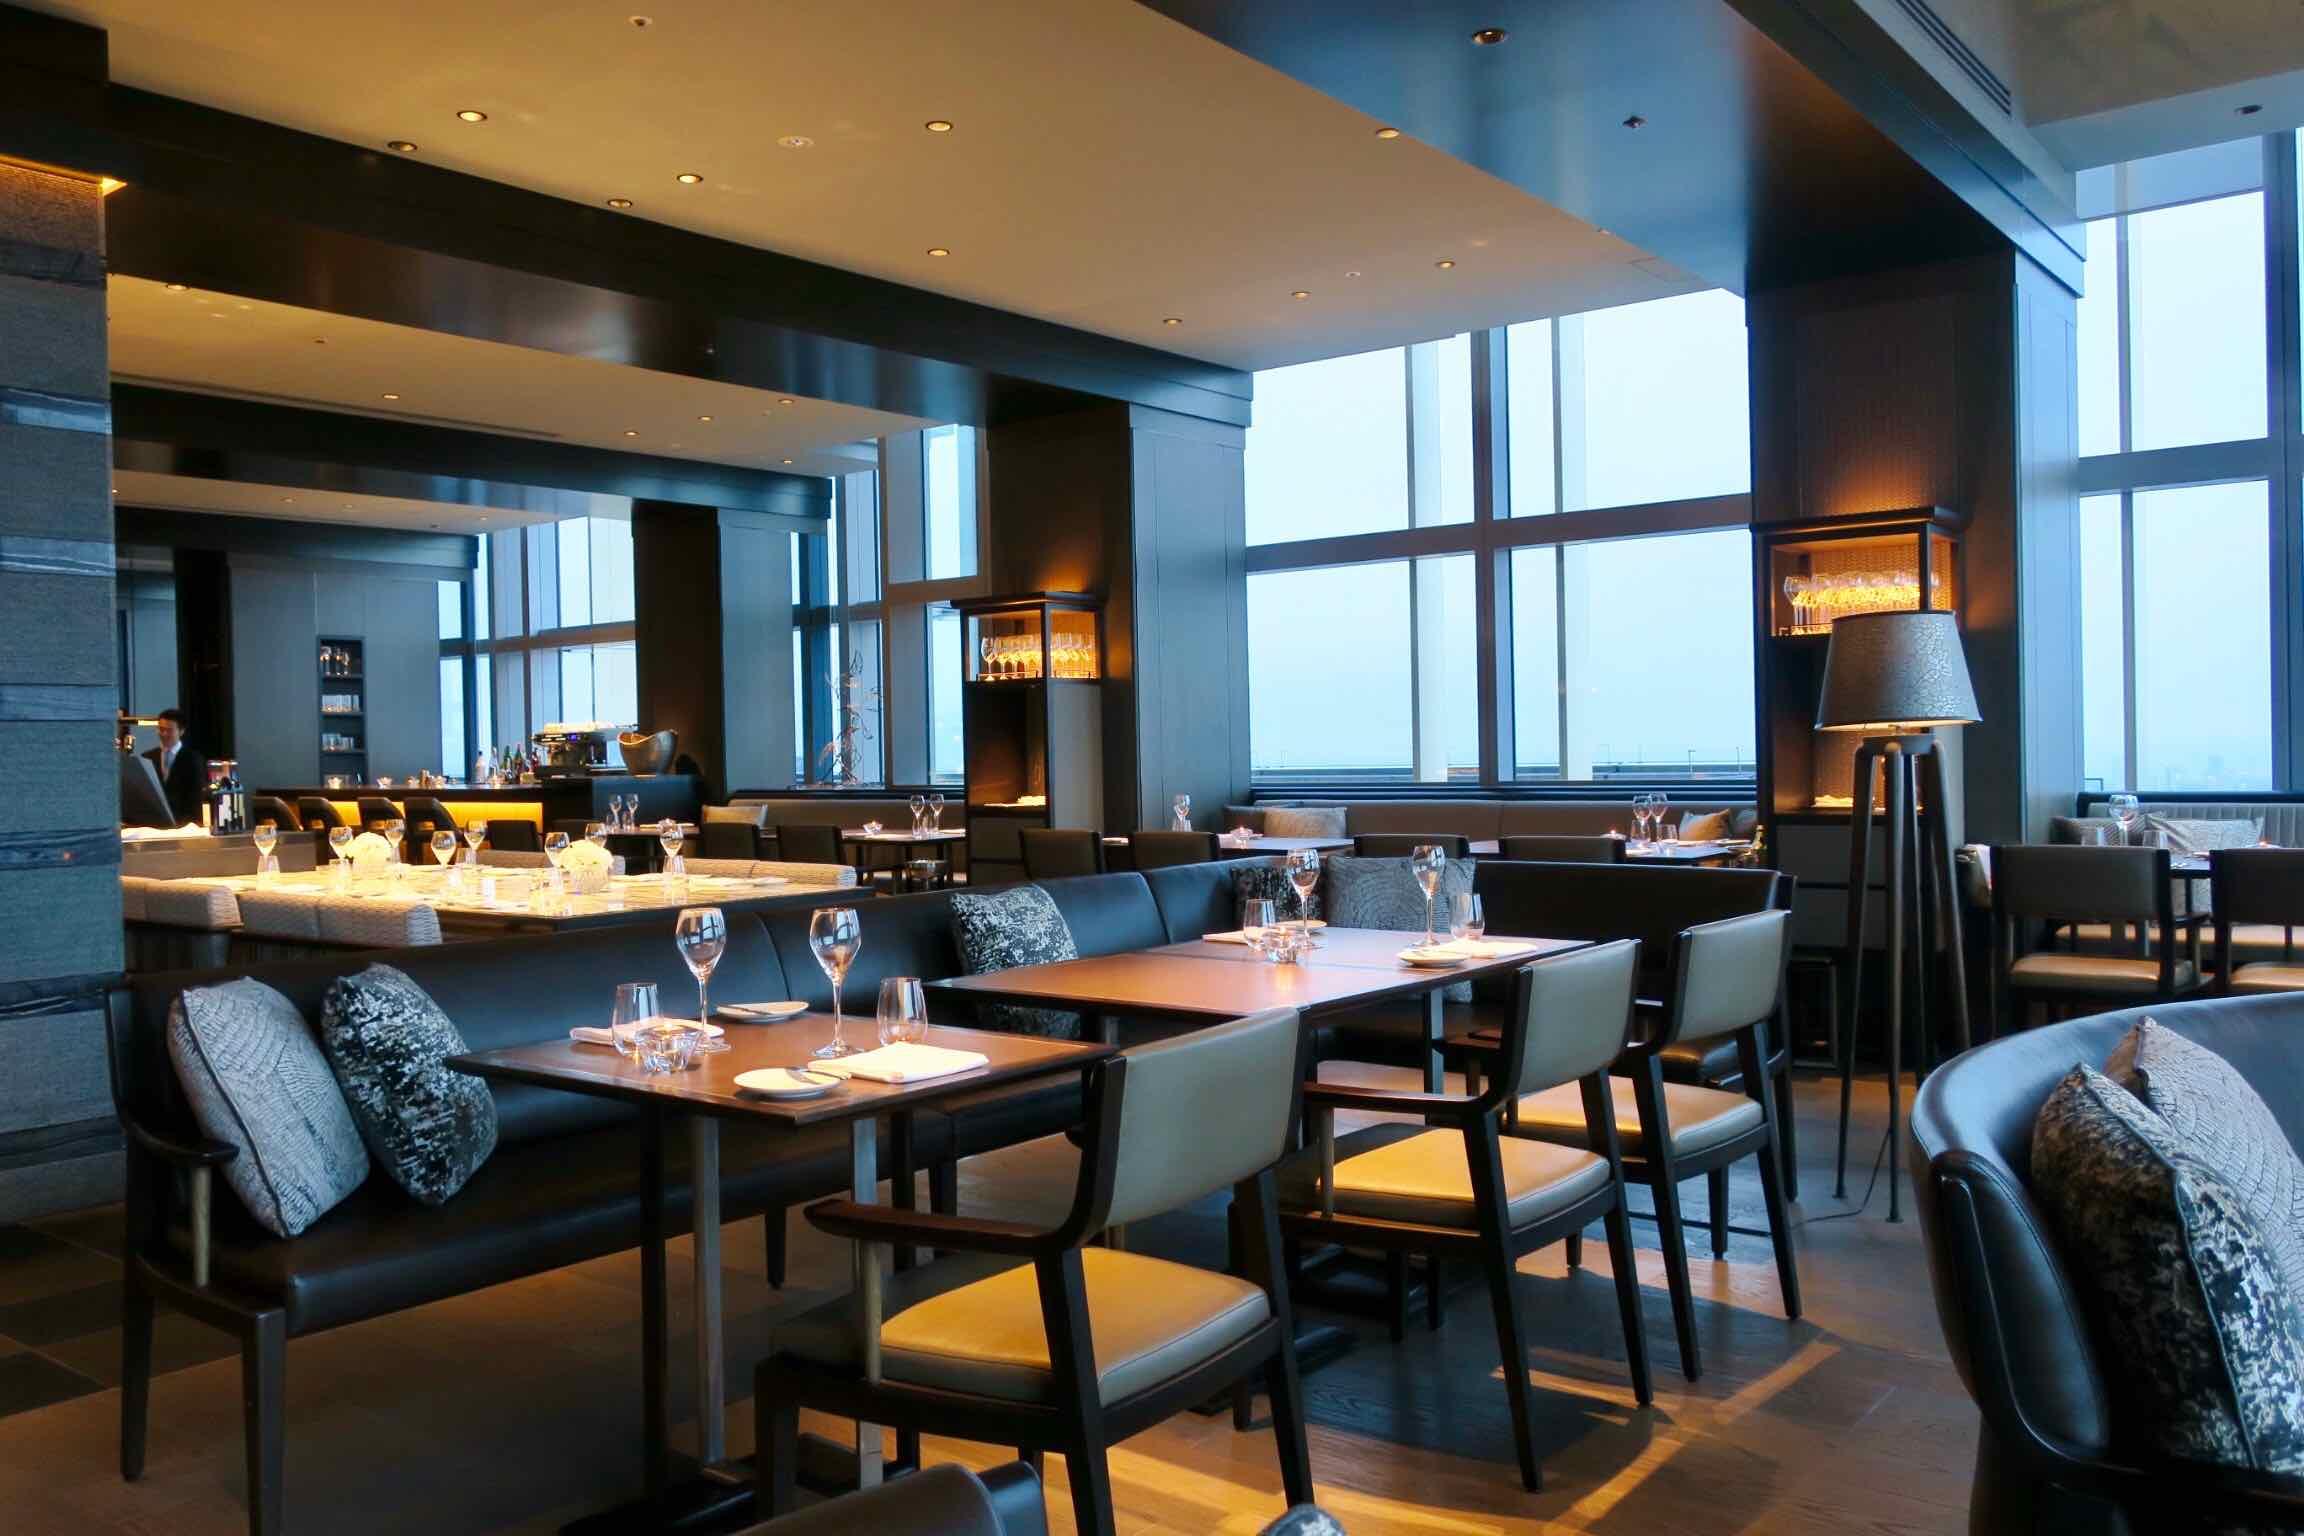 The Ritz-Carlton, Tokyo restaurant